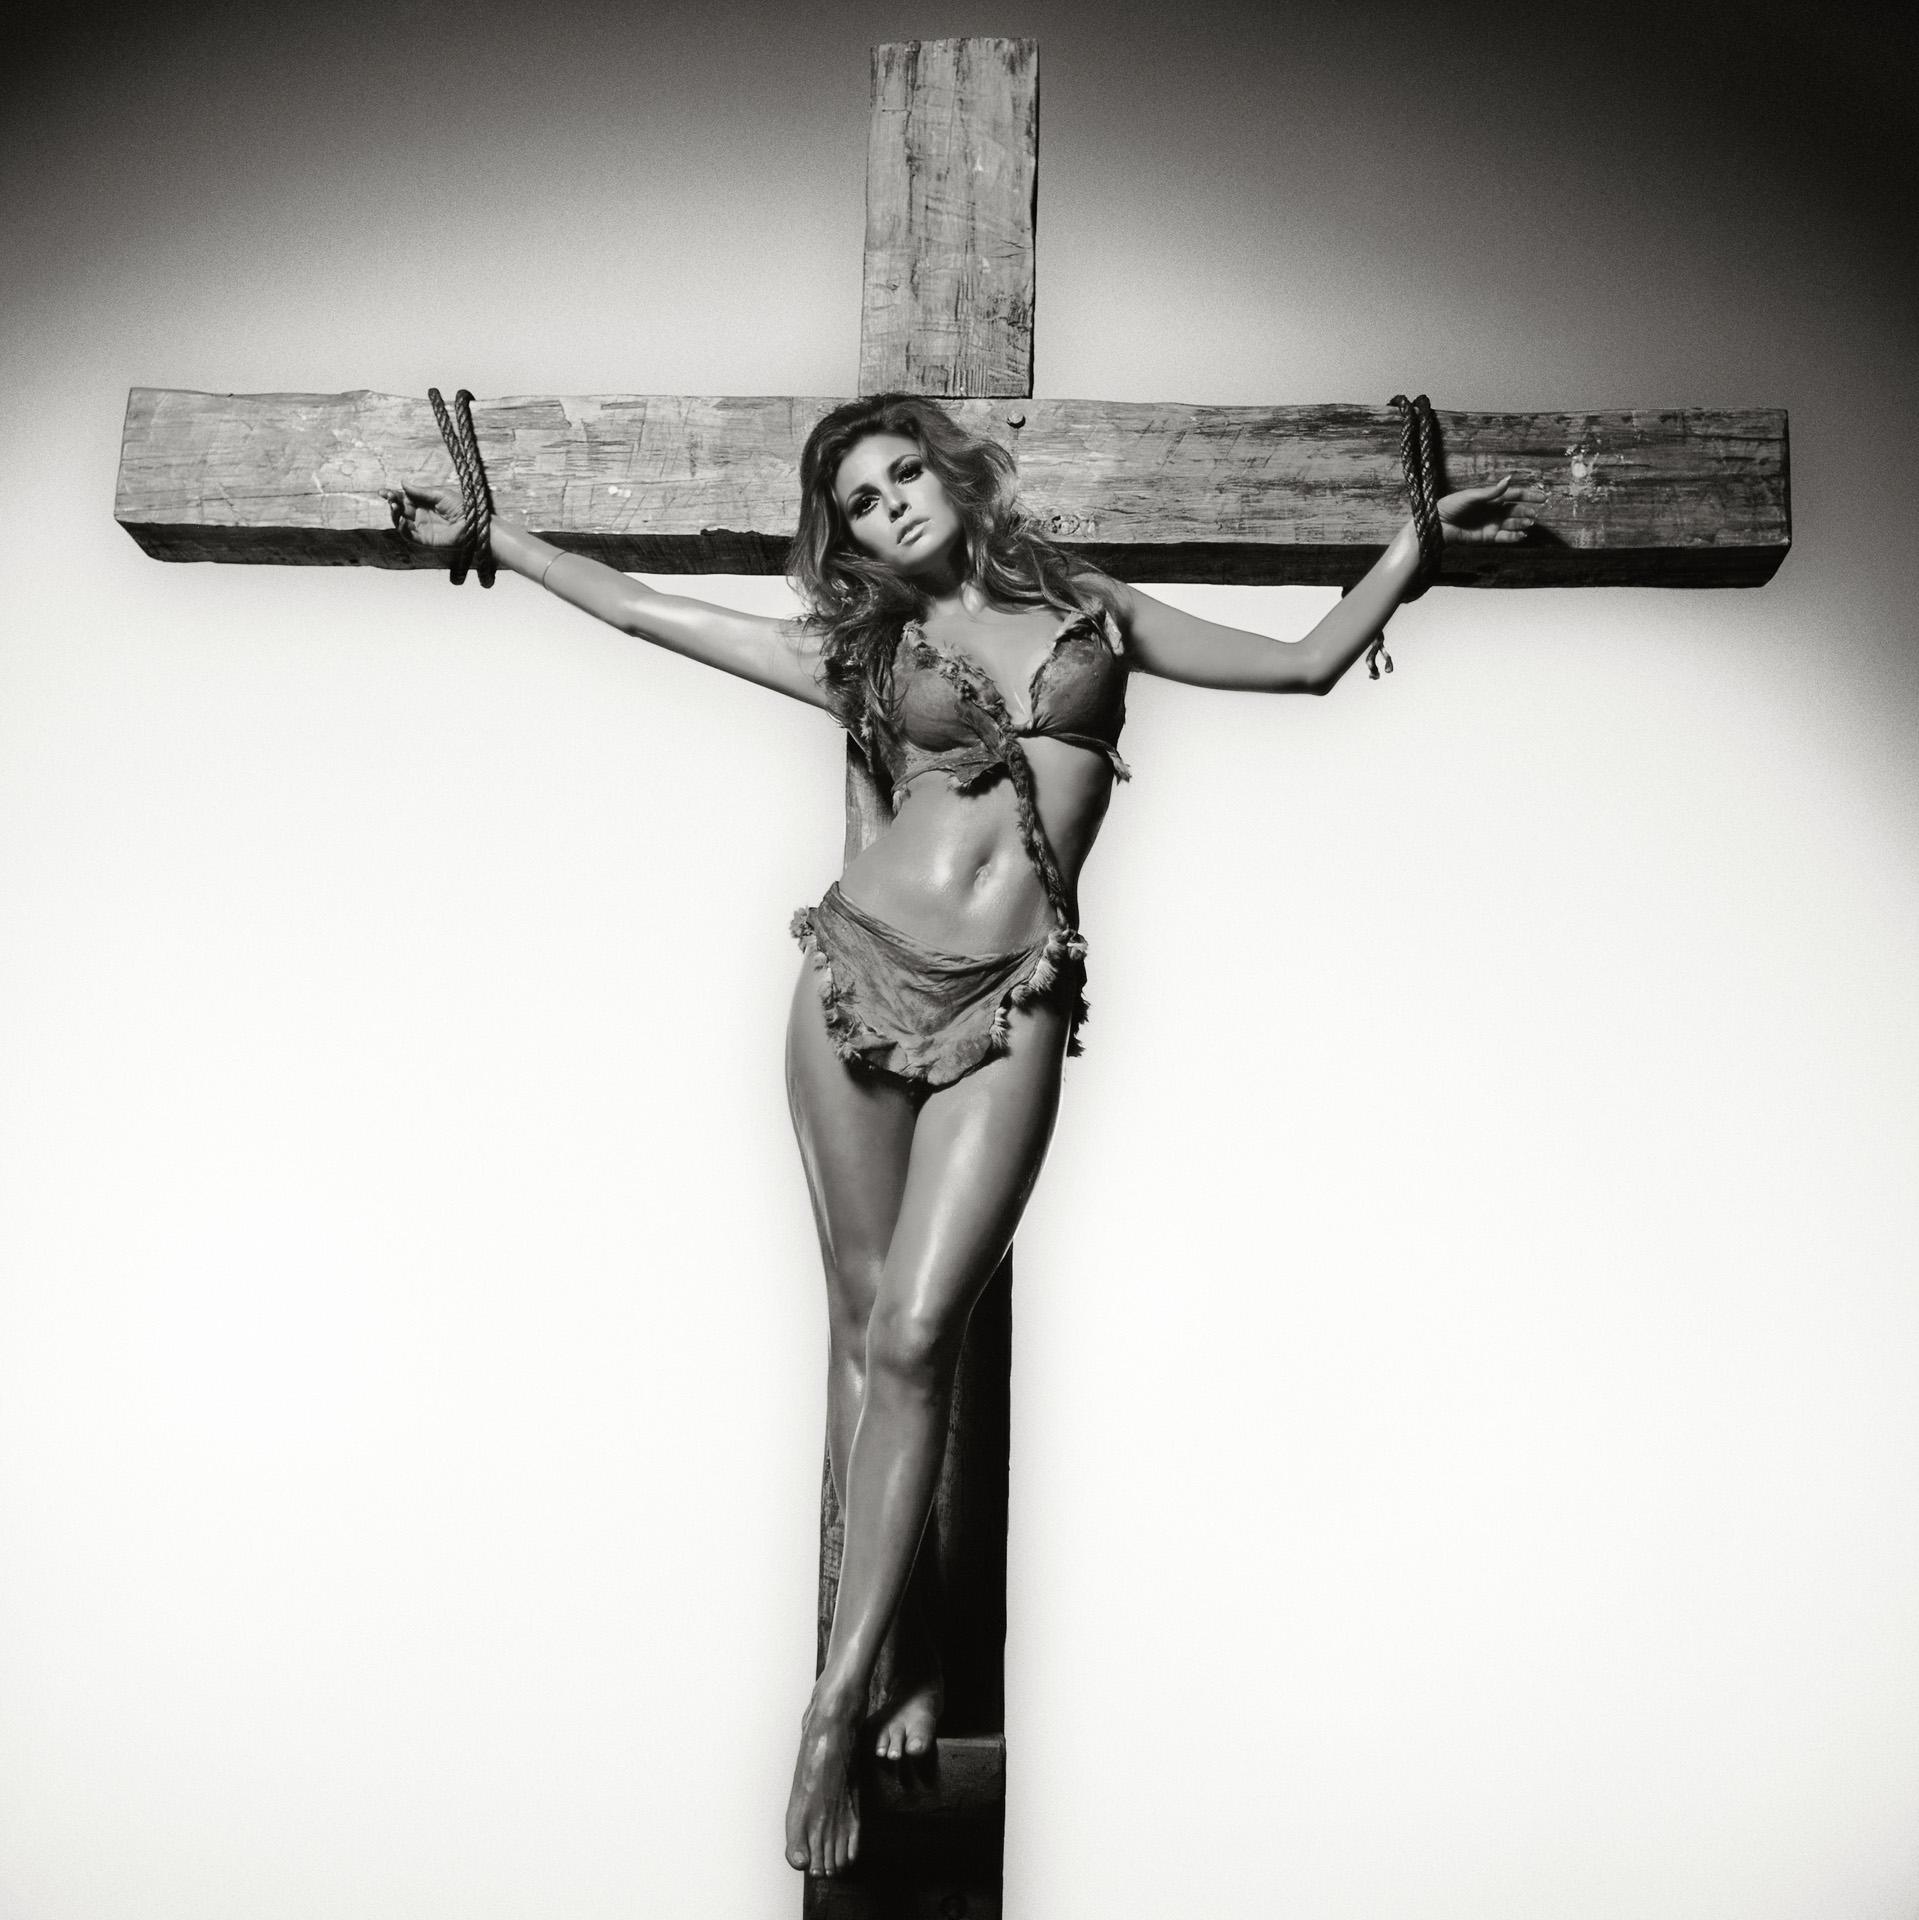 Amy O Neill Nude terry o'neill 1938-2019 r.i.p - the eye of photography magazine